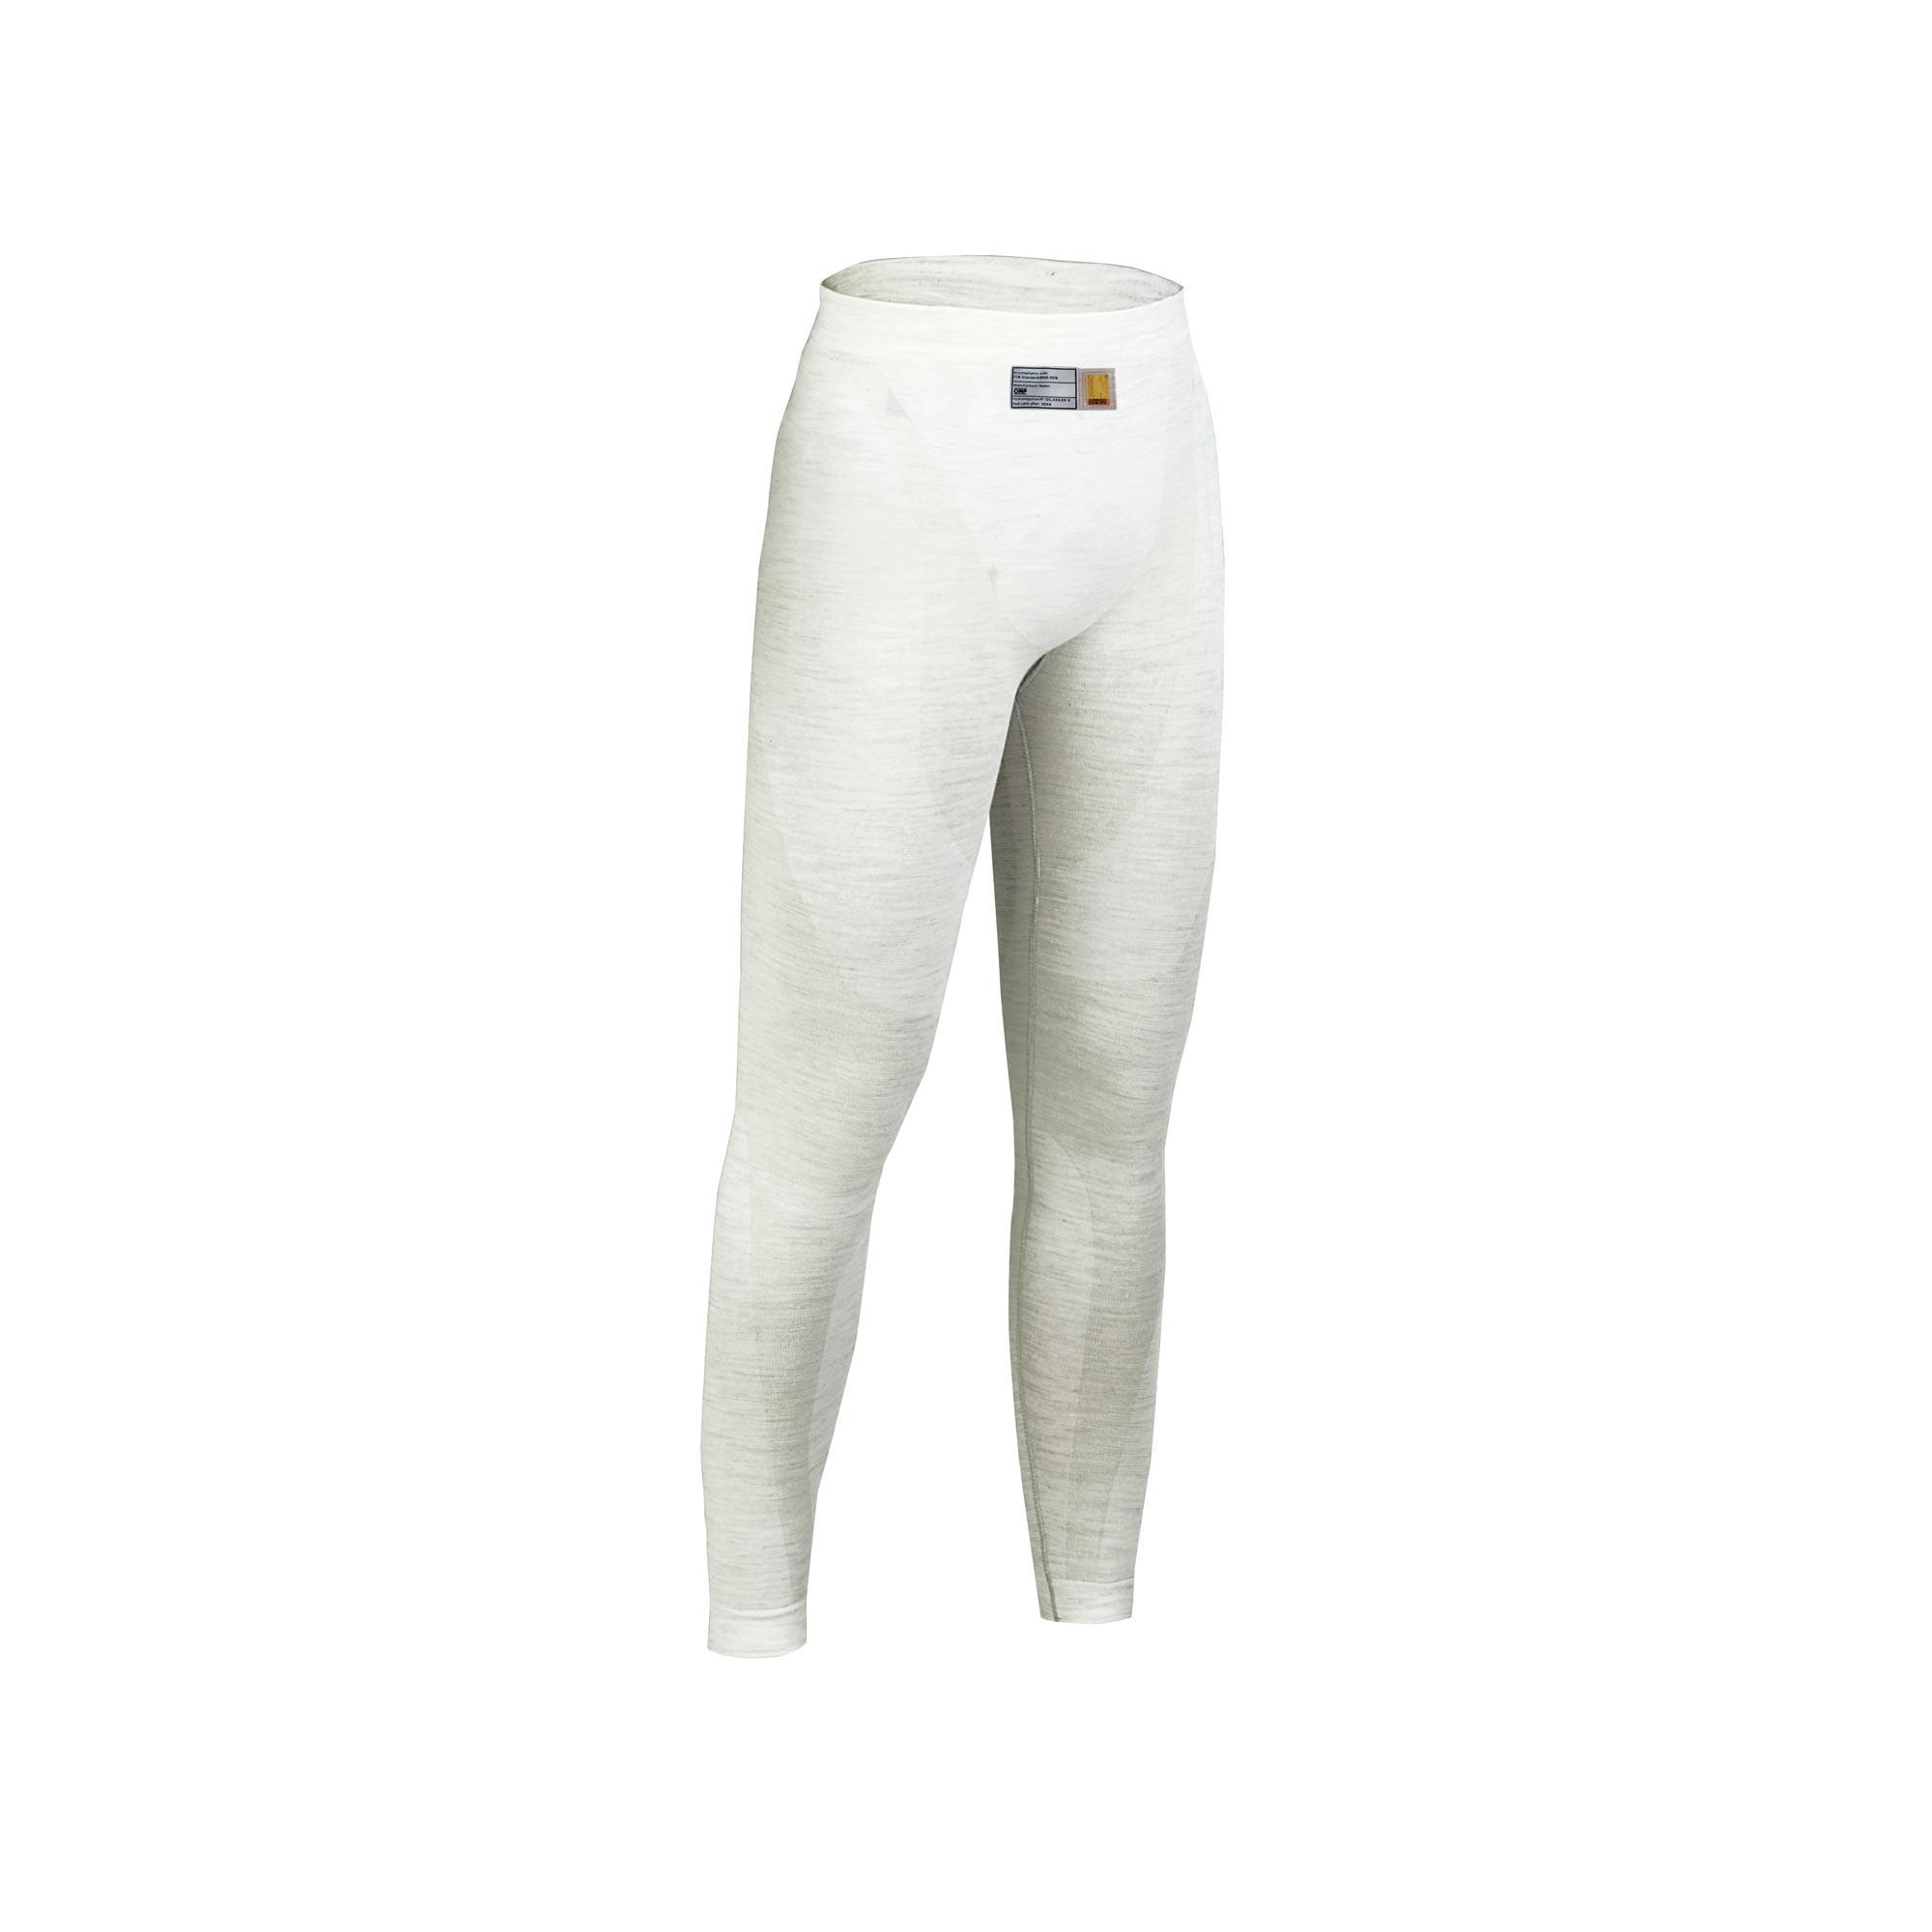 ONE UNDERWEAR PANTS WHITE SIZE L FIA 8856-2018